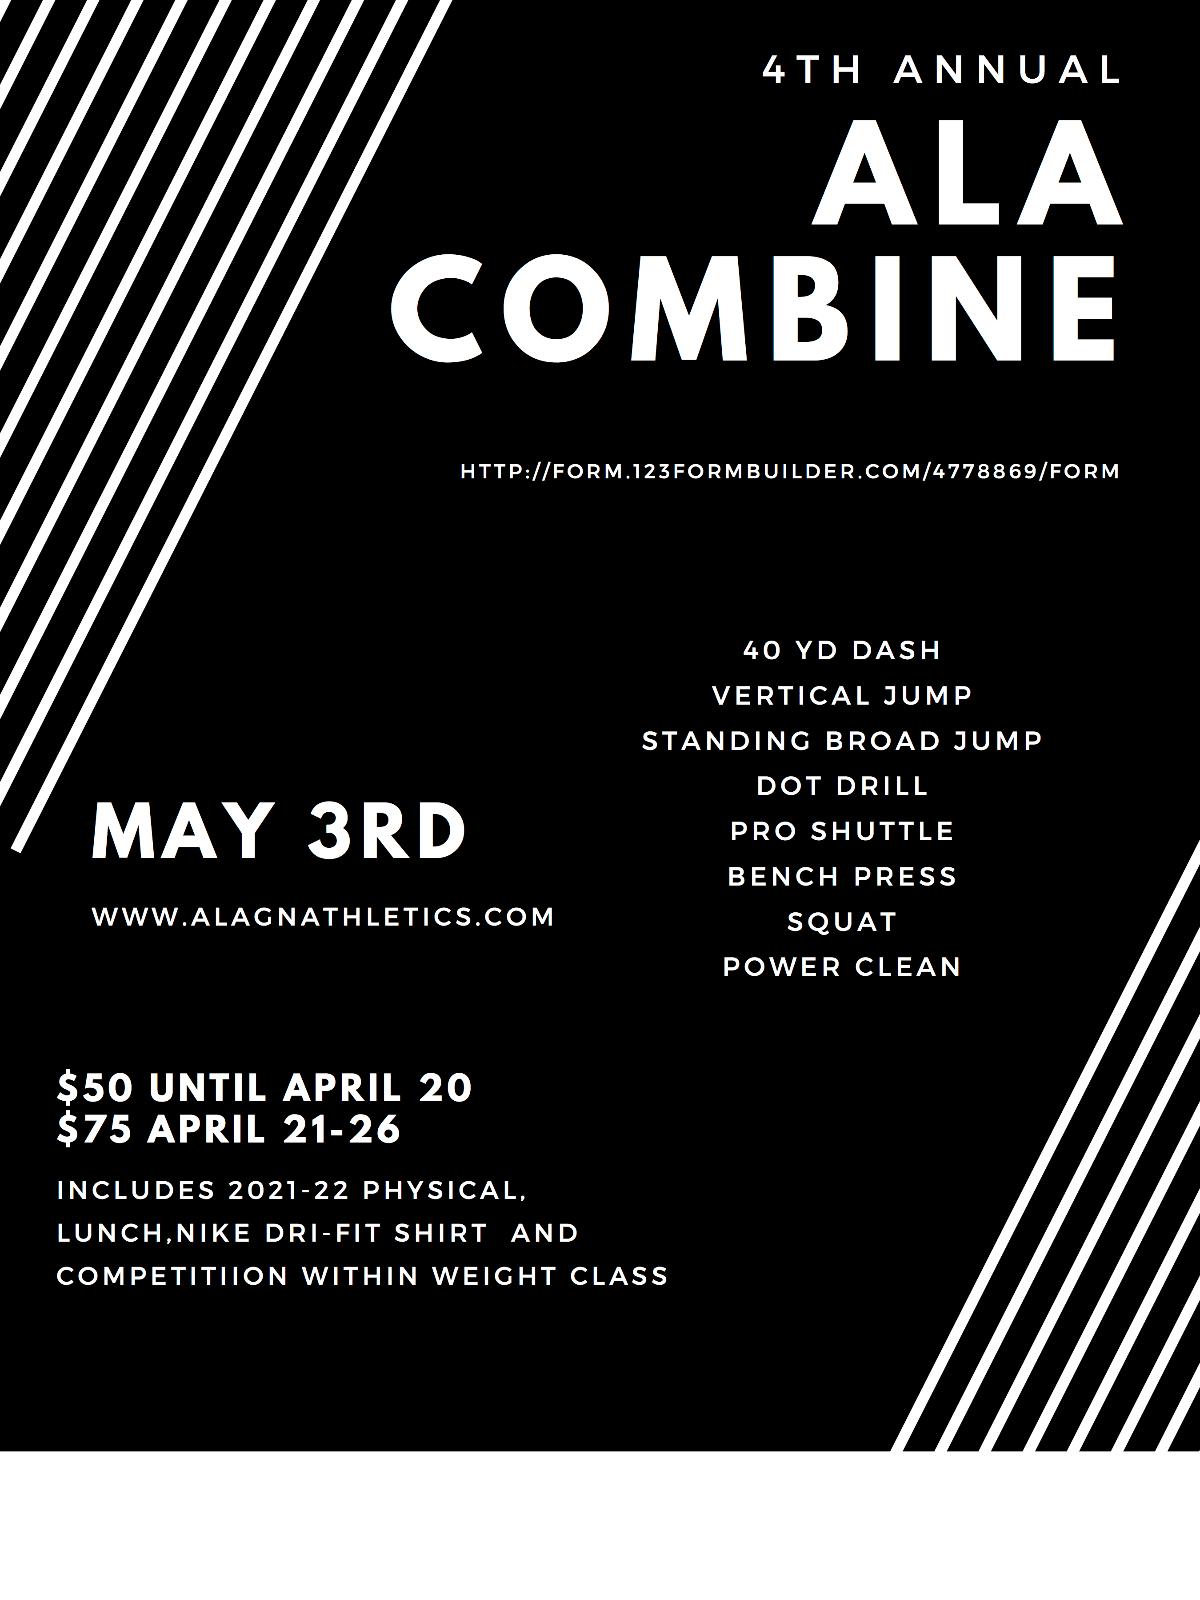 ALA Combine – May 3rd